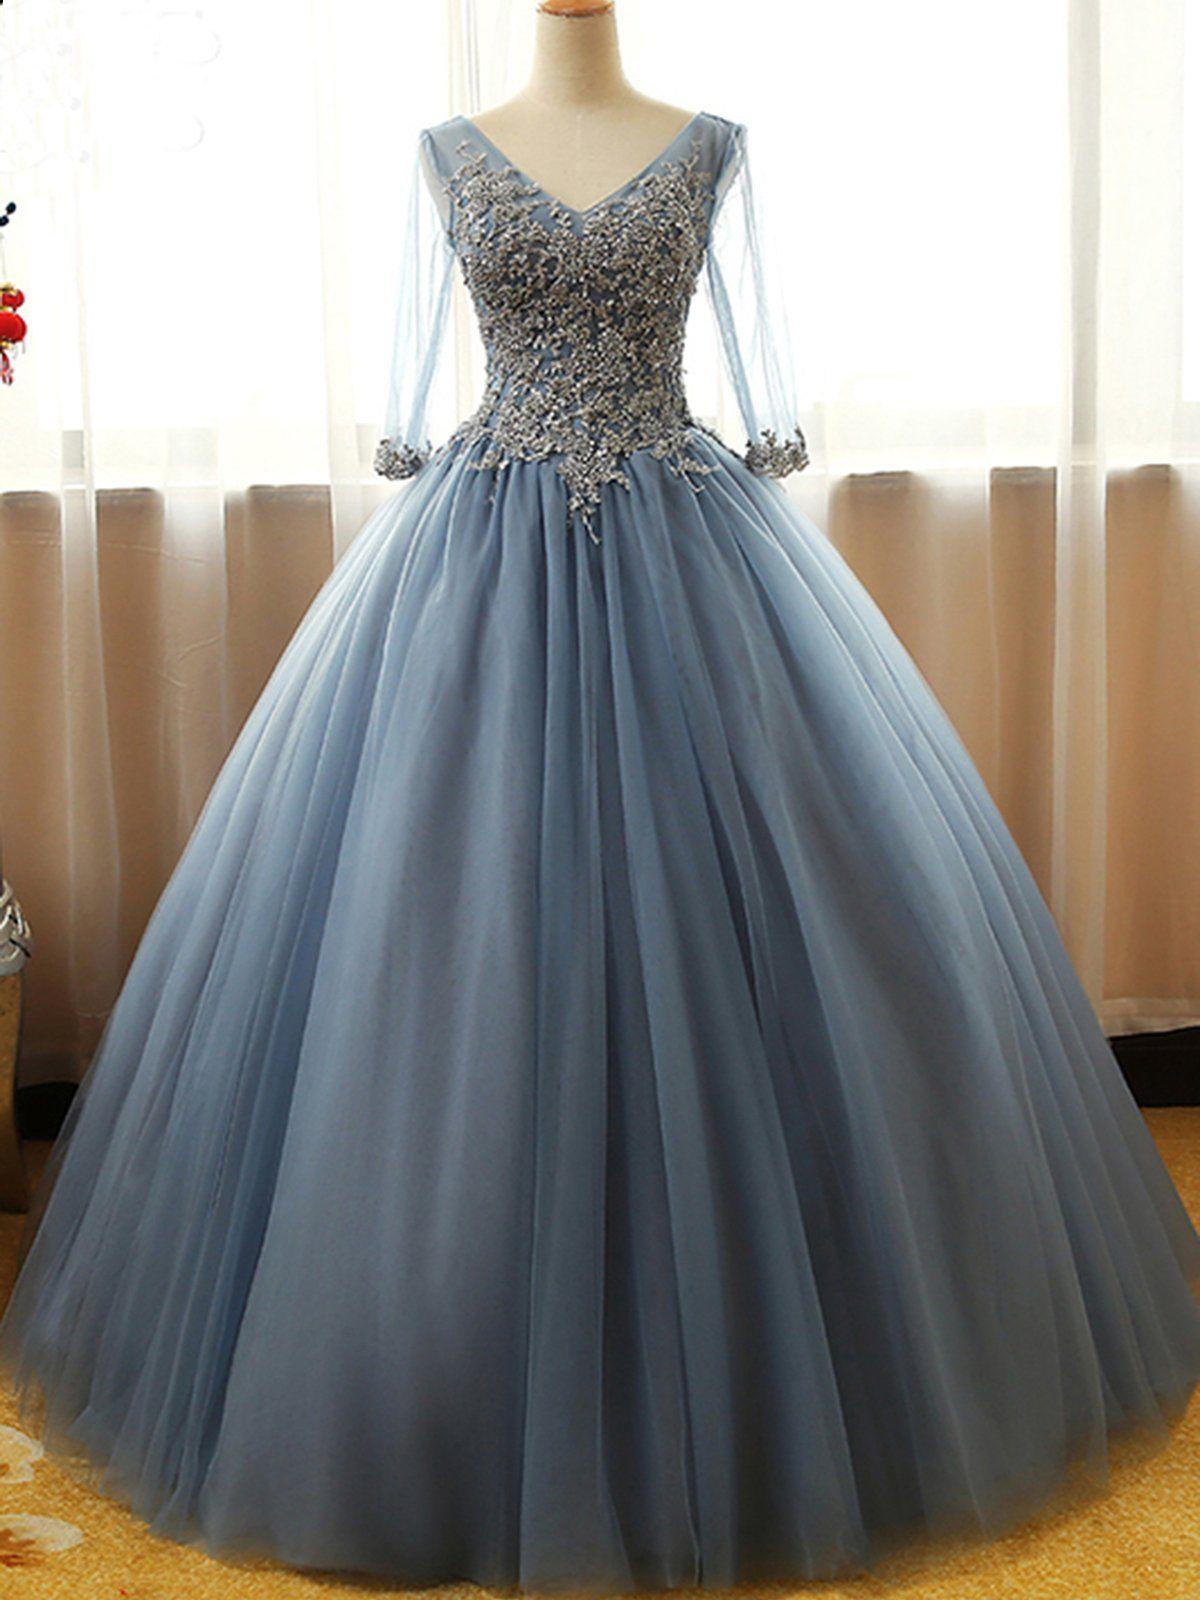 Gorgeous Long Blue Half Sleeve Prom Dresses Floor Length Long Dusty B Bemybridesm Long Sleeve Evening Dresses Lace Evening Dresses Prom Dresses With Sleeves [ 1600 x 1200 Pixel ]